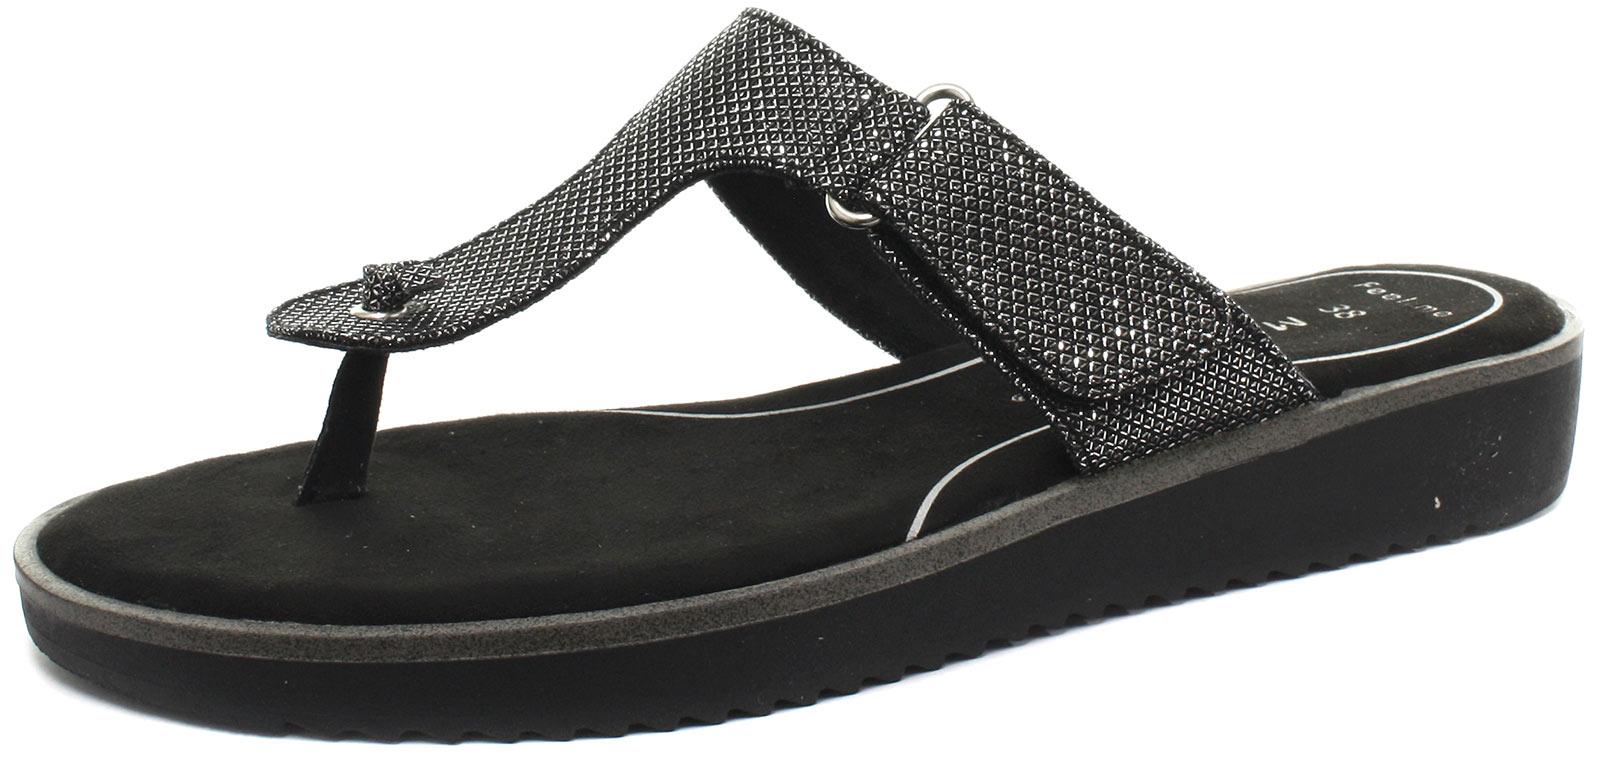 Marco Tozzi 27101 Silver Womens Flip Flops Toe Post Sandals Size UK 3.5 EU 36